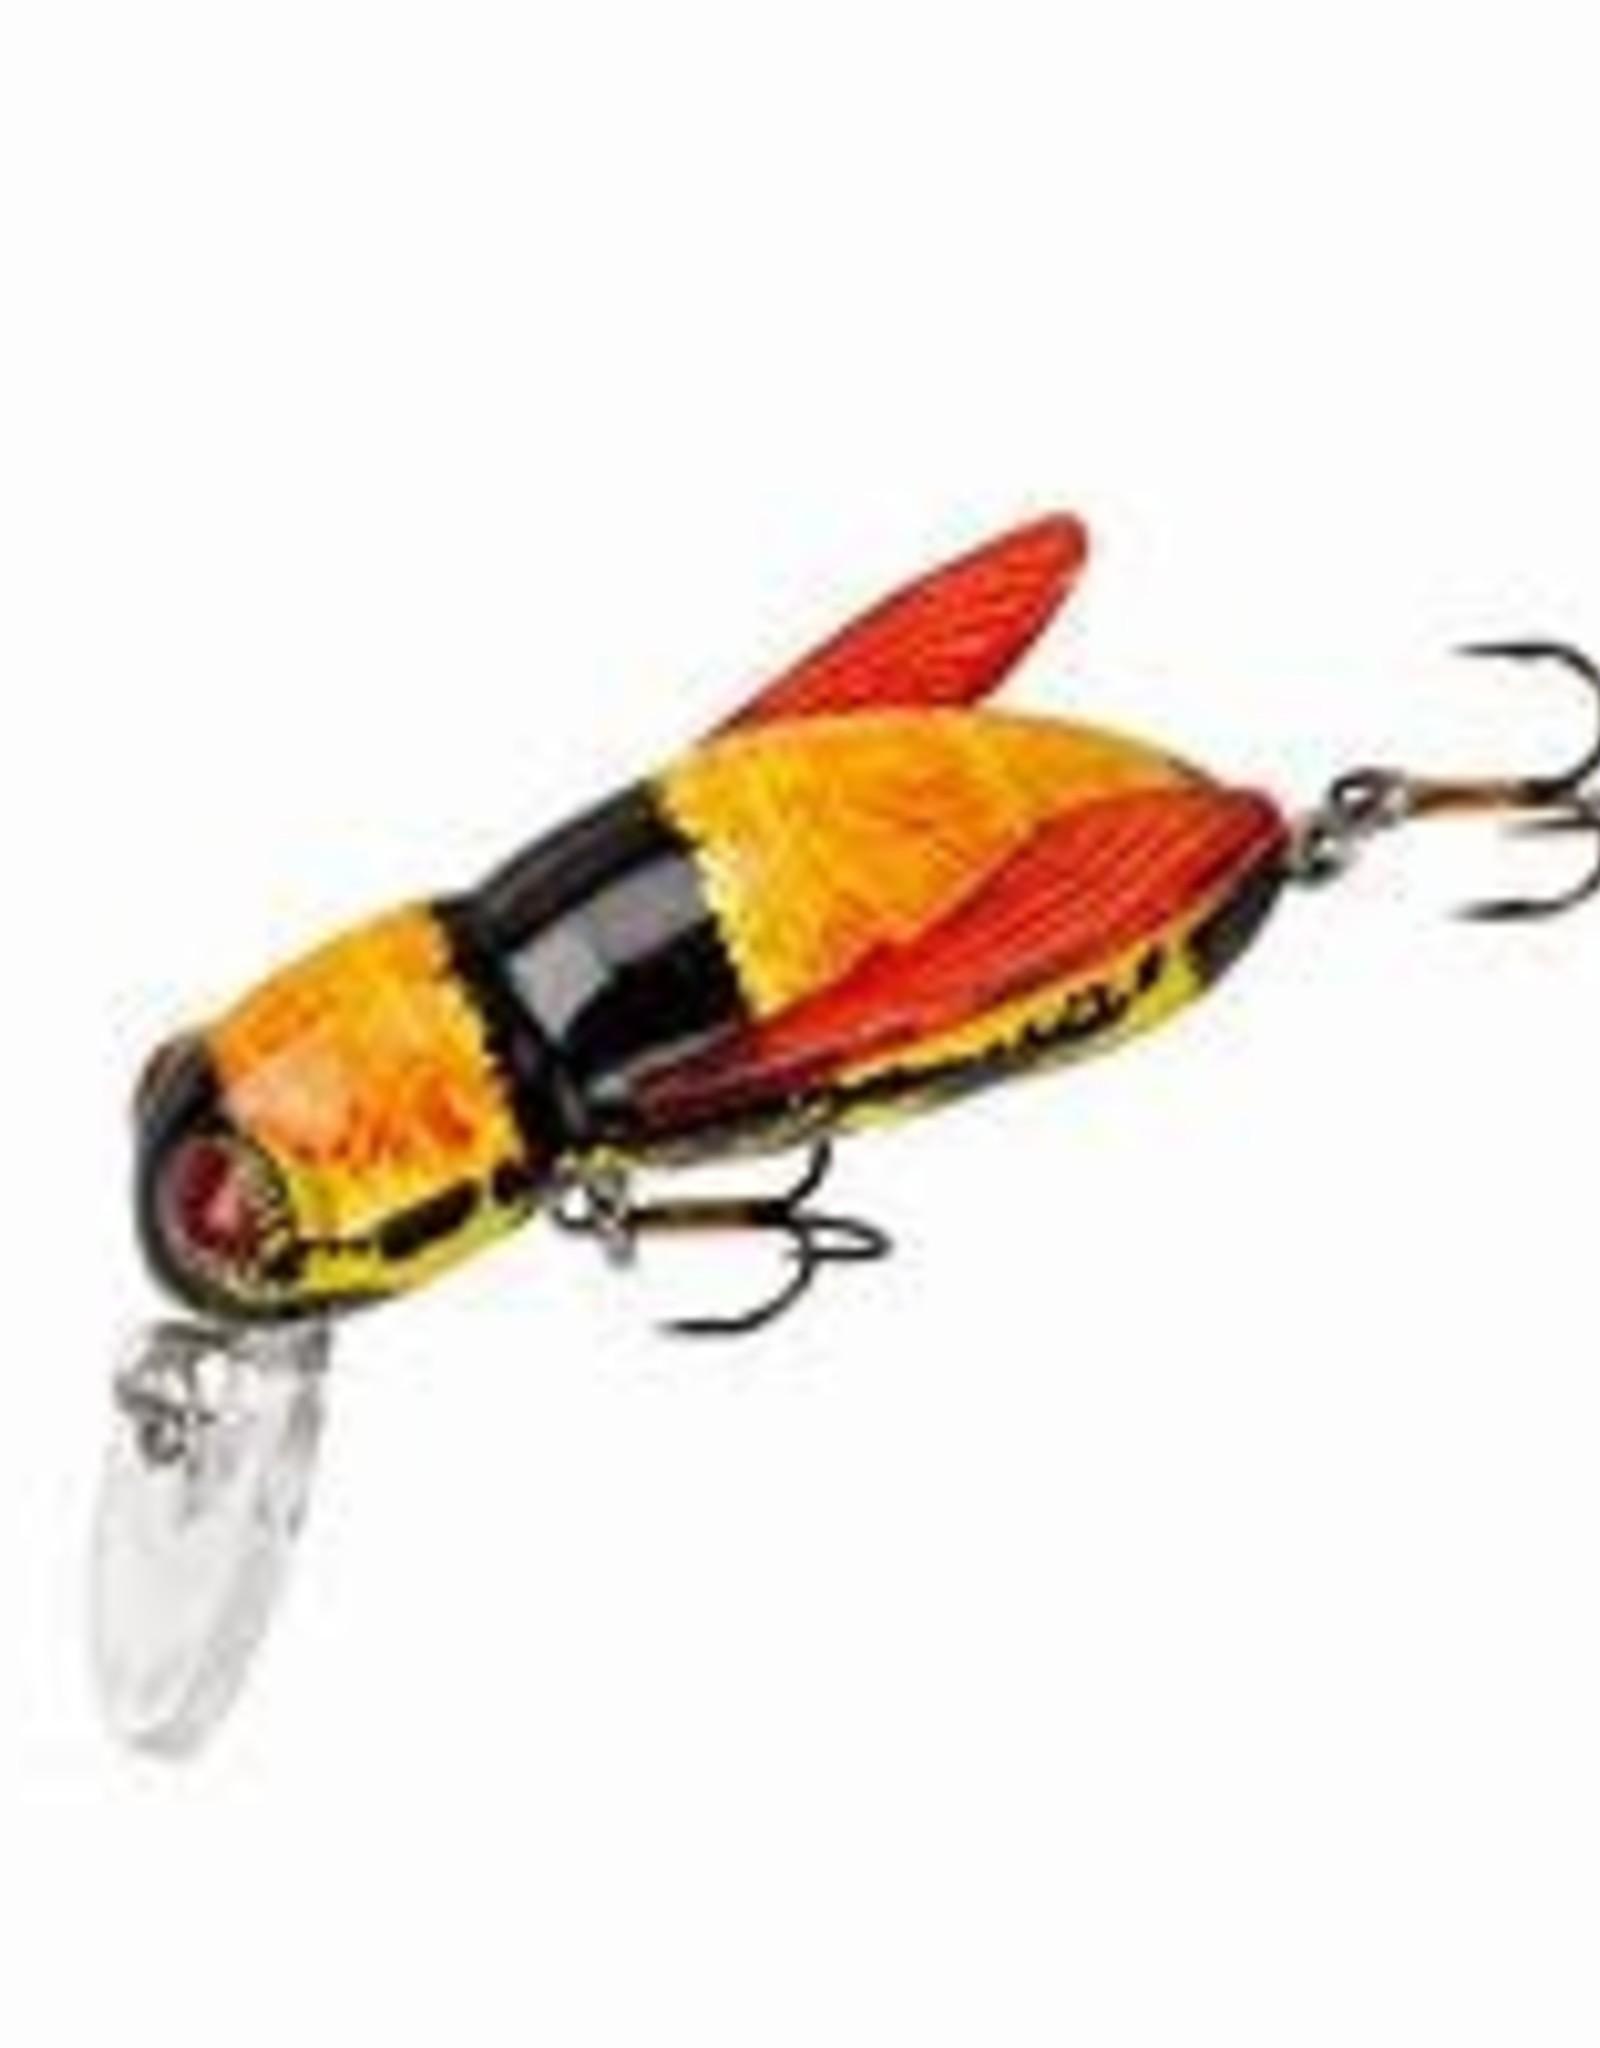 "Rebel 1/2"", 7/64 oz, Bumble Bee, Floating Rebel F7410 Bumble Bug Crankbait, 1"